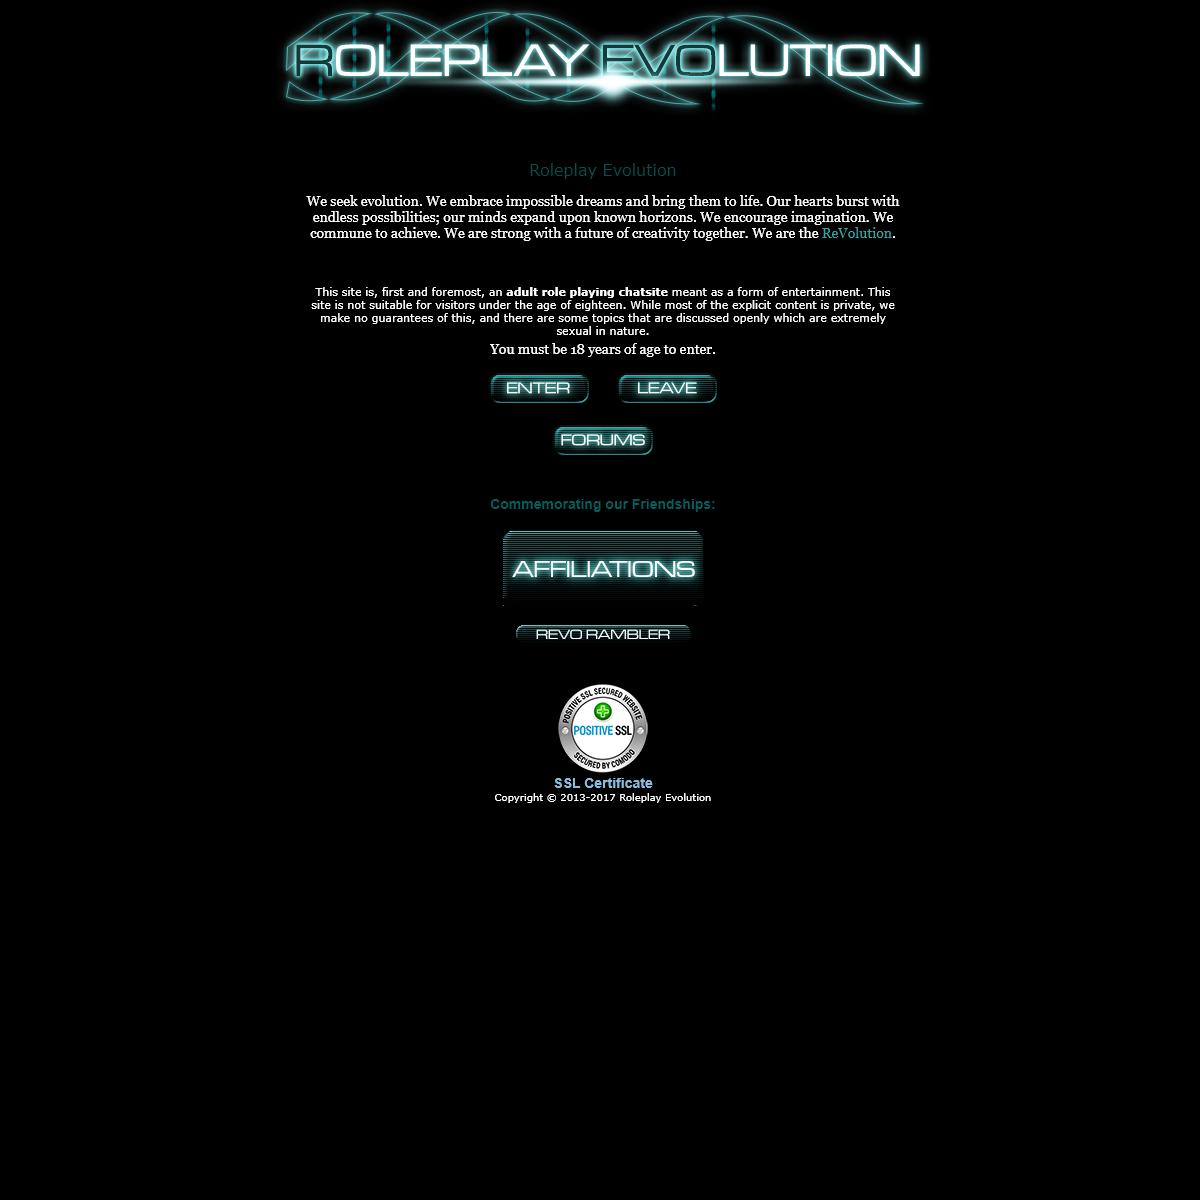 Roleplay Evolution